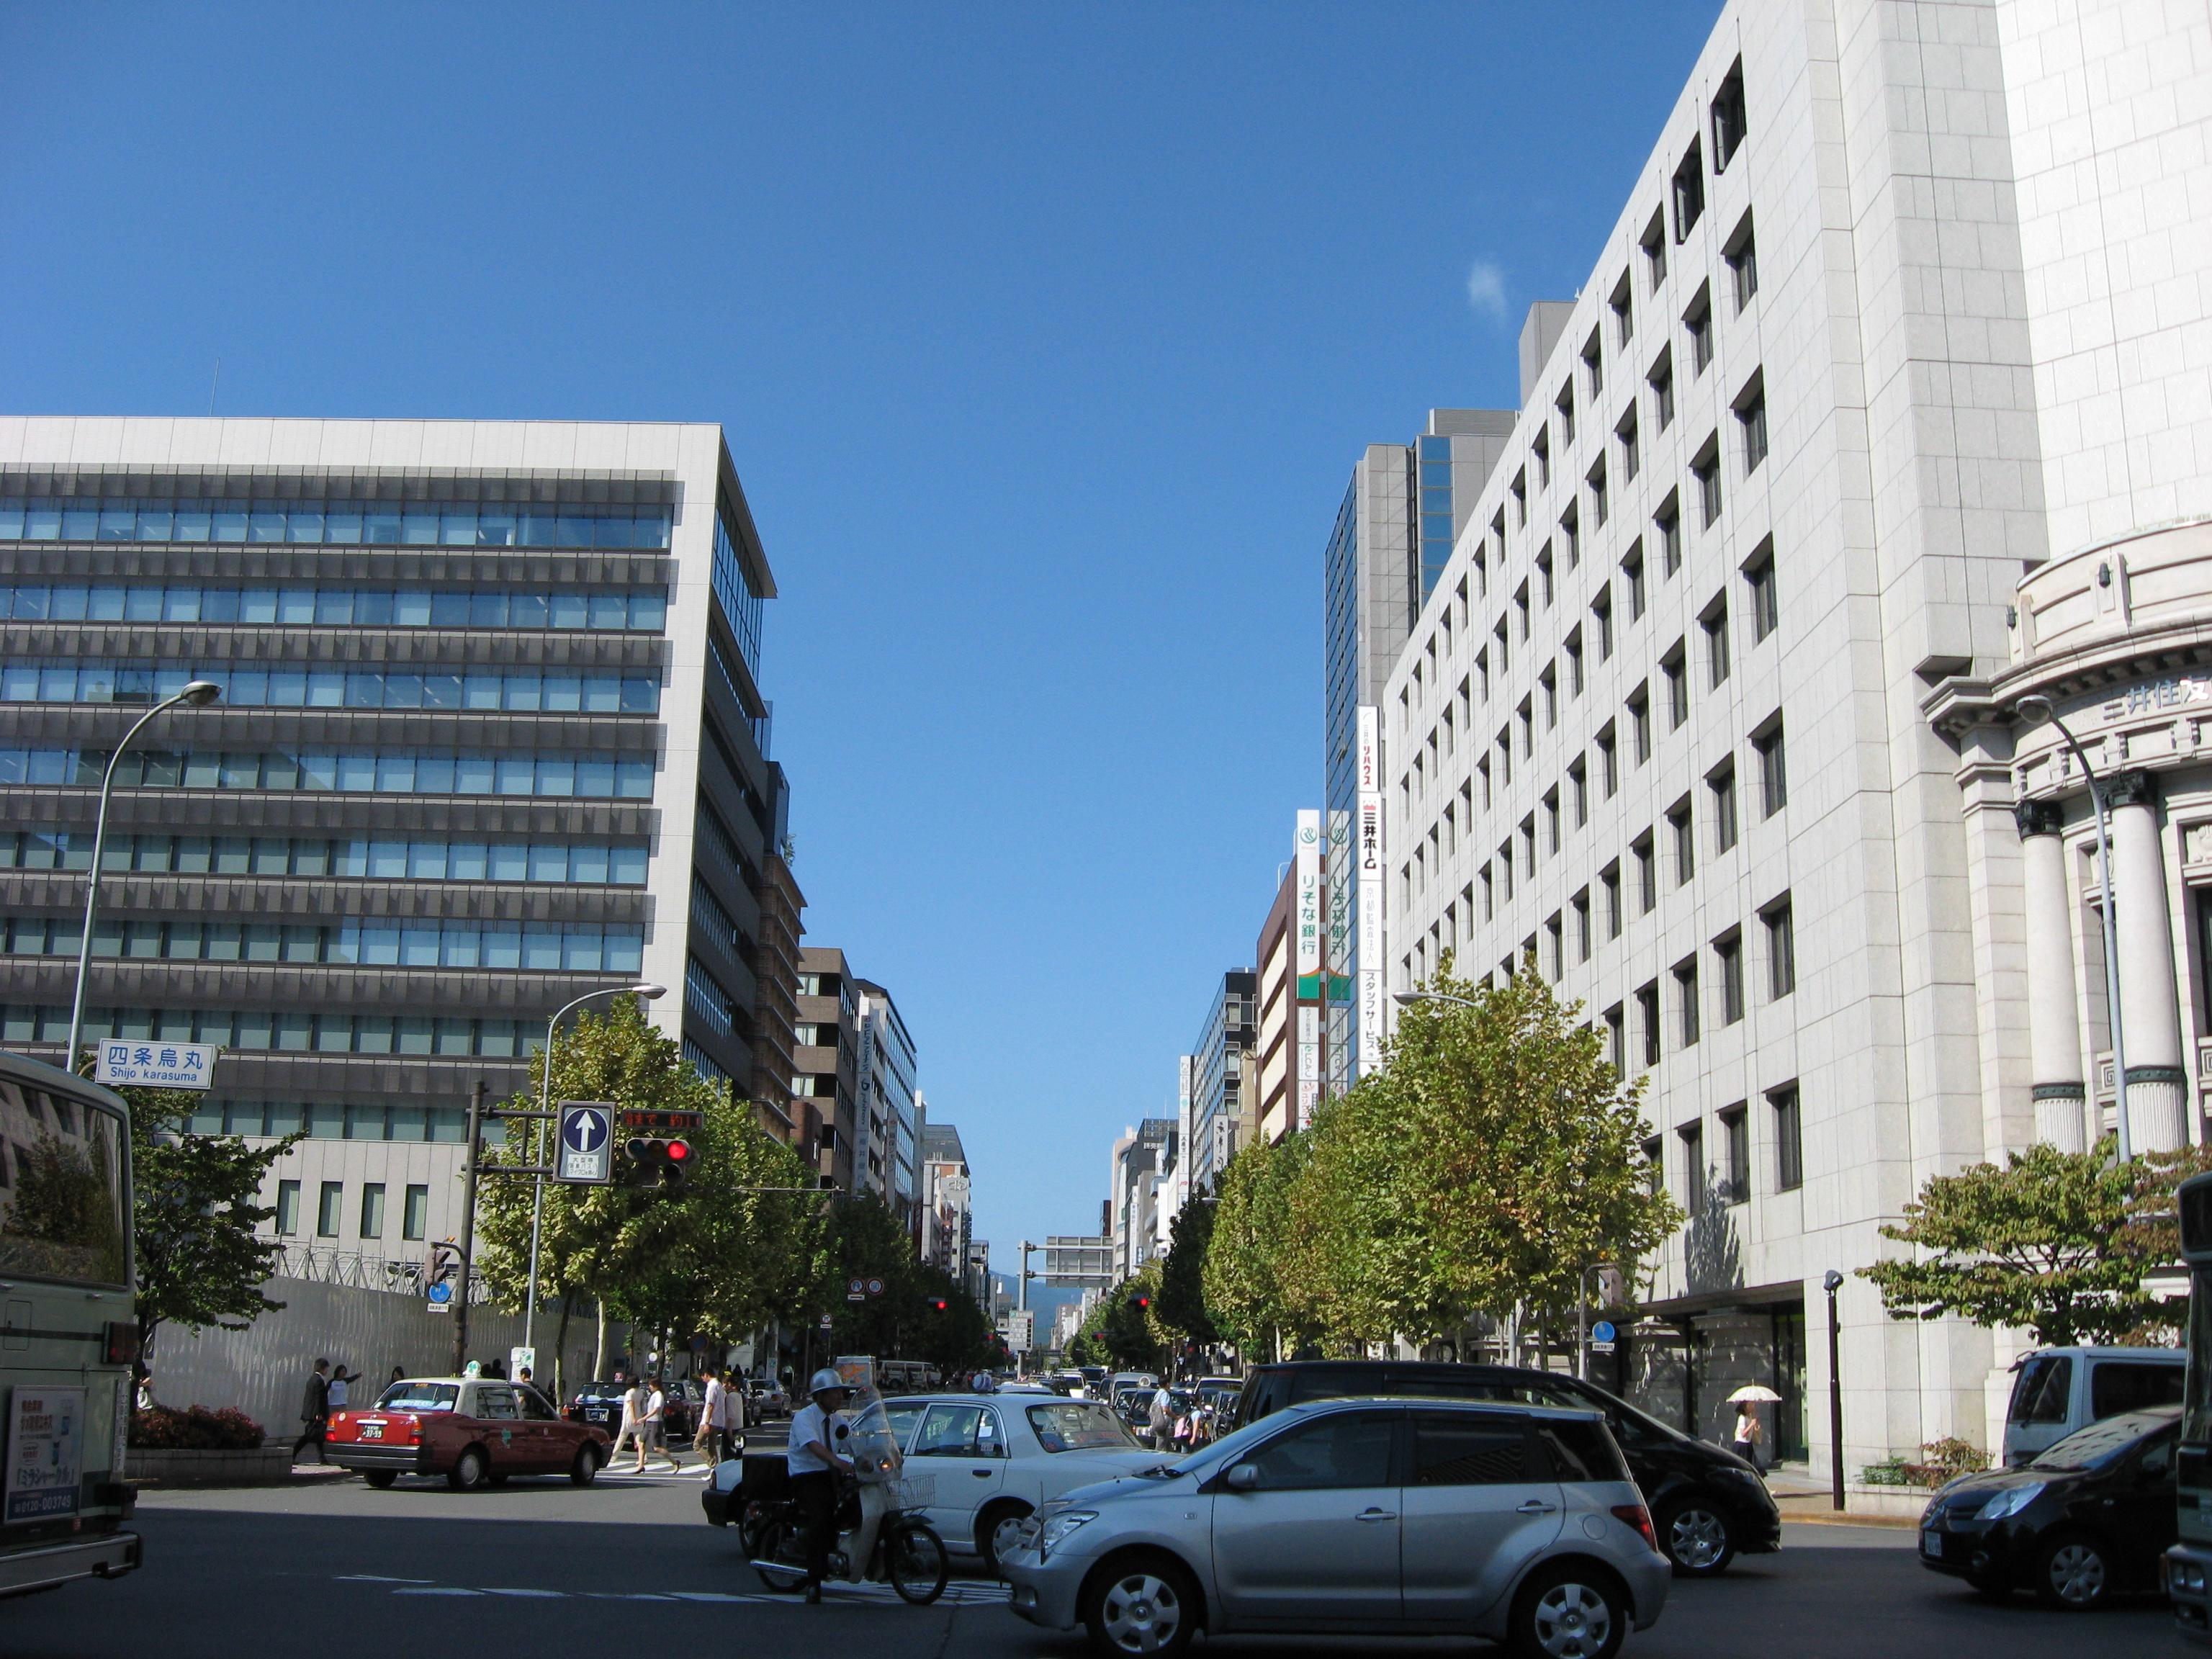 https://upload.wikimedia.org/wikipedia/commons/f/f9/Shijo_Karasuma_North_Side.jpg